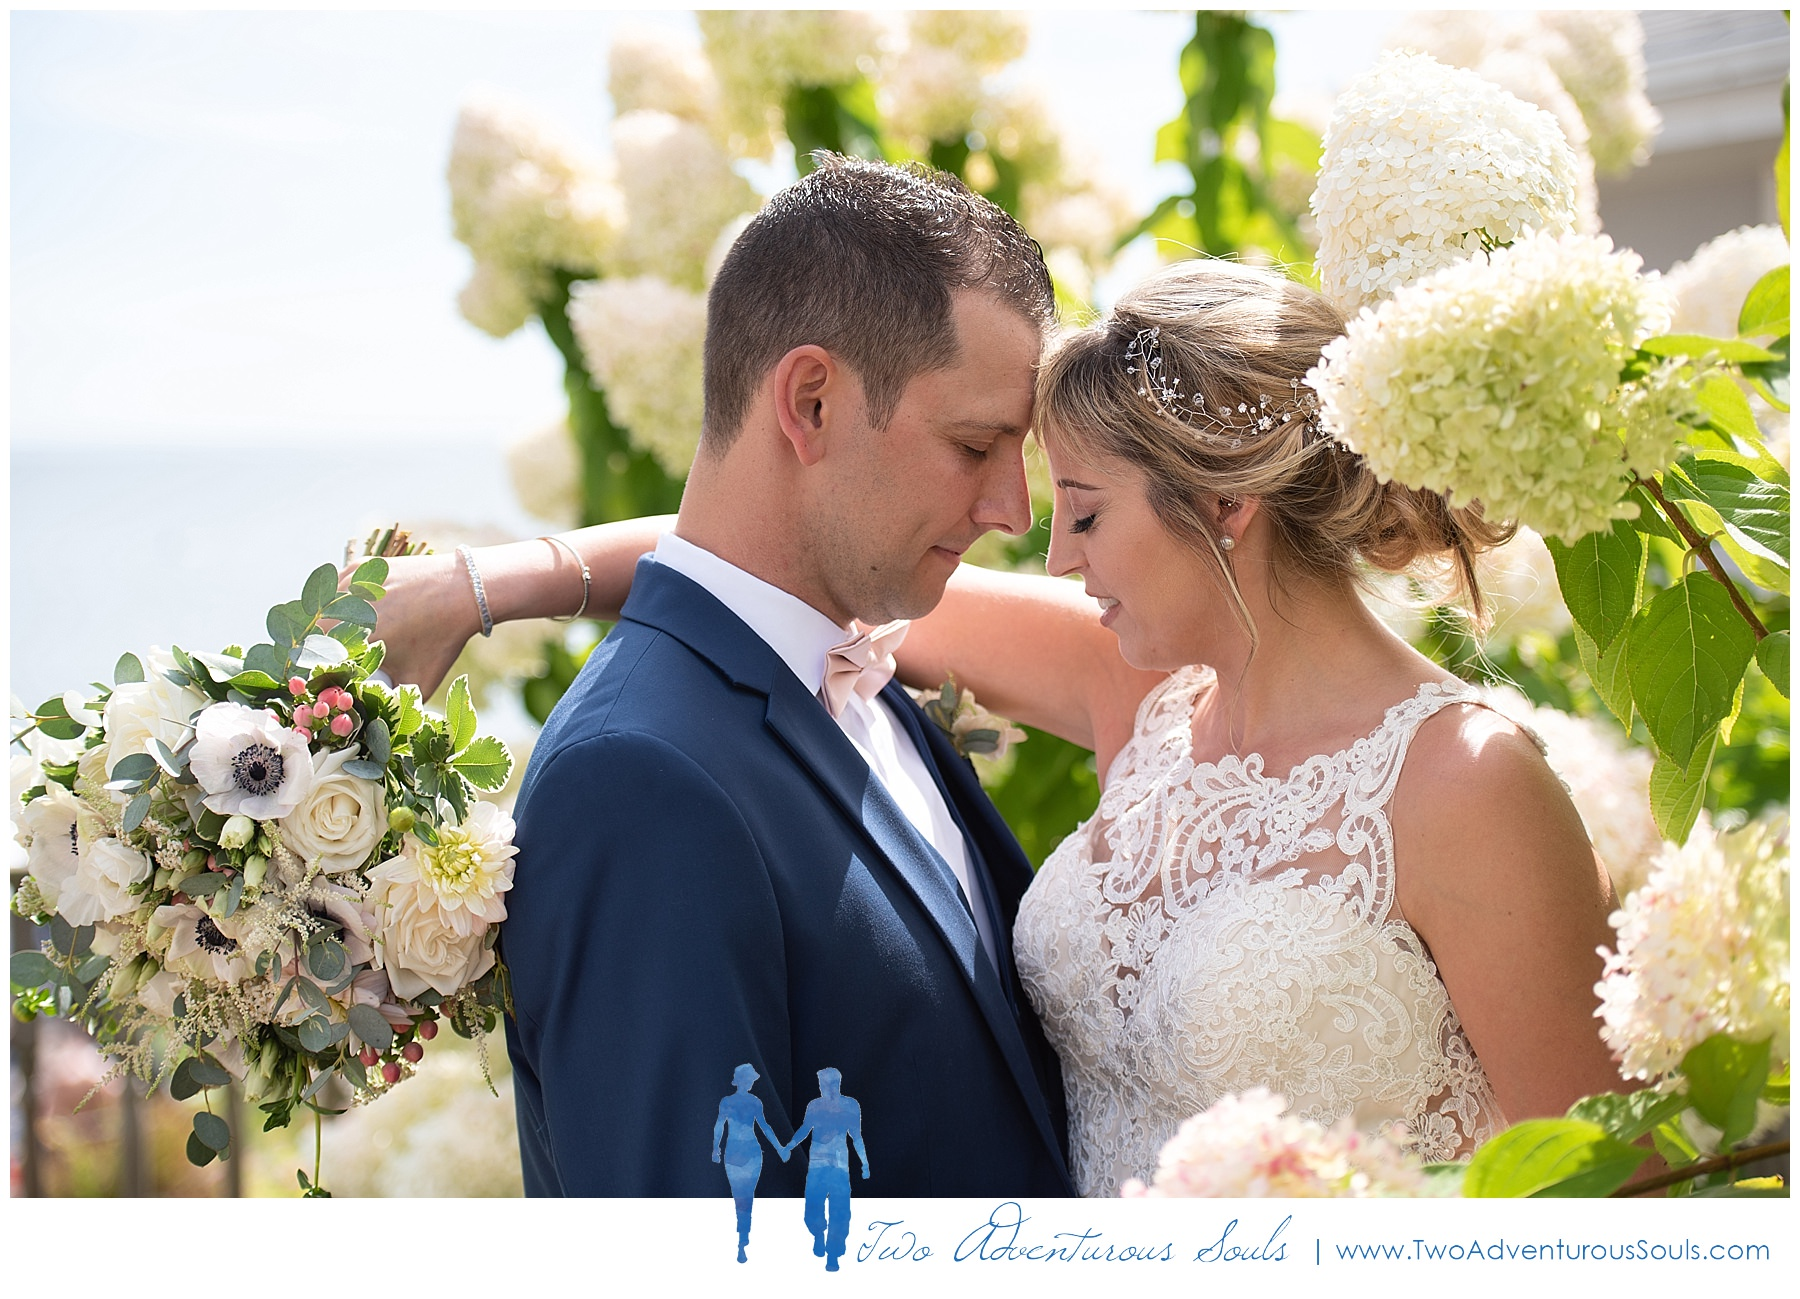 Connecticut Wedding Photographers, Lace Factory Wedding Photographers, Two Adventurous Souls - 083119_0025.jpg